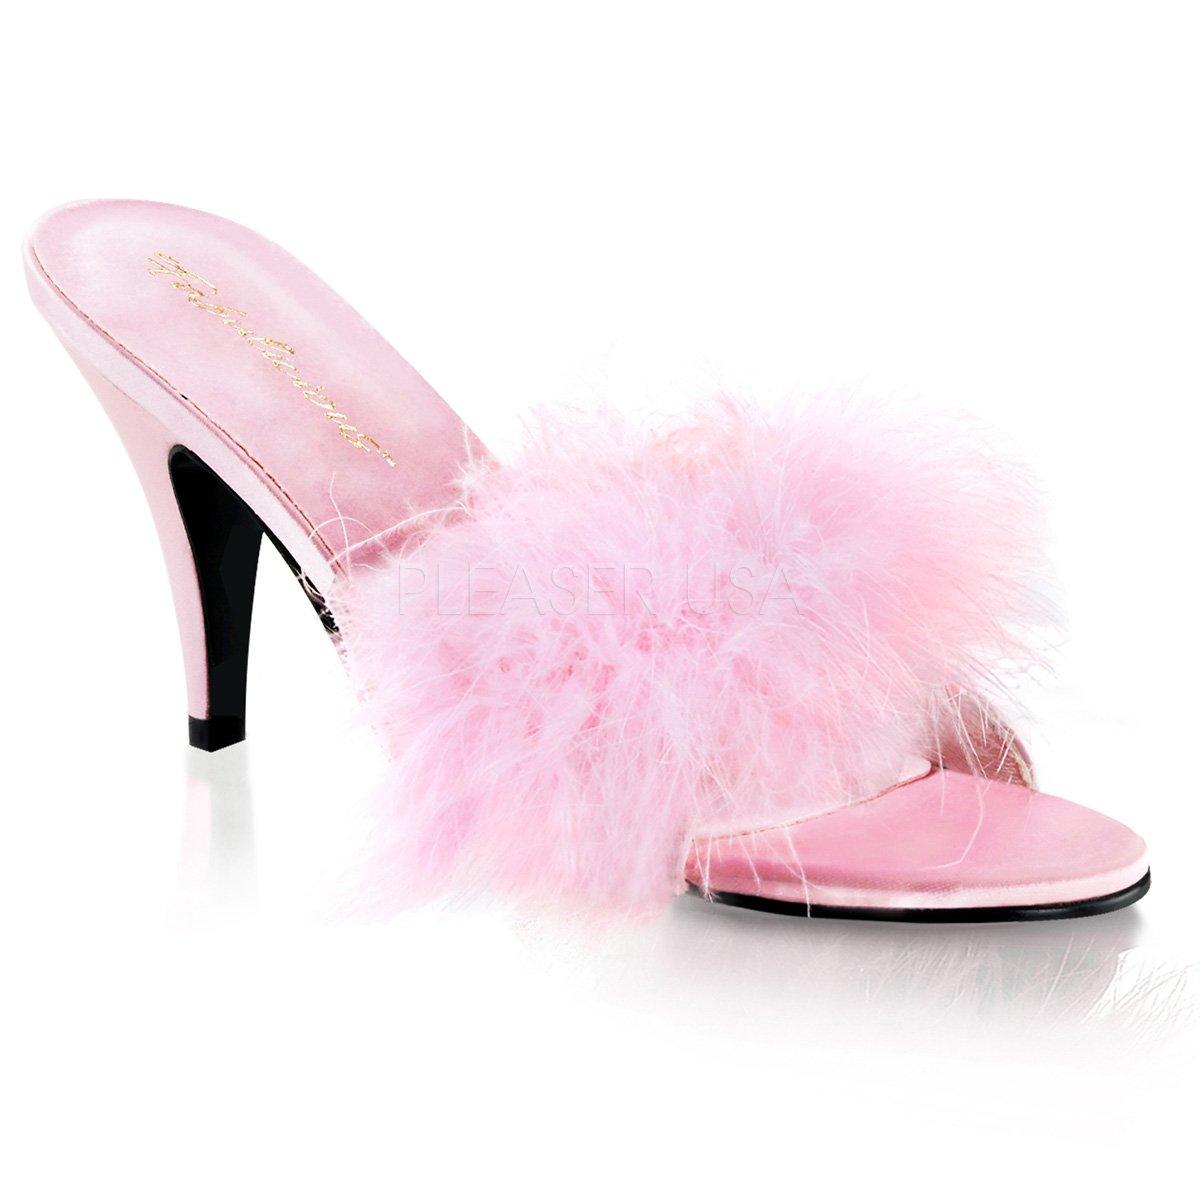 Pleaser Women's Amour-03 Sandal B00HVA0XTK 5 B(M) US|Baby Pink Satin-fur